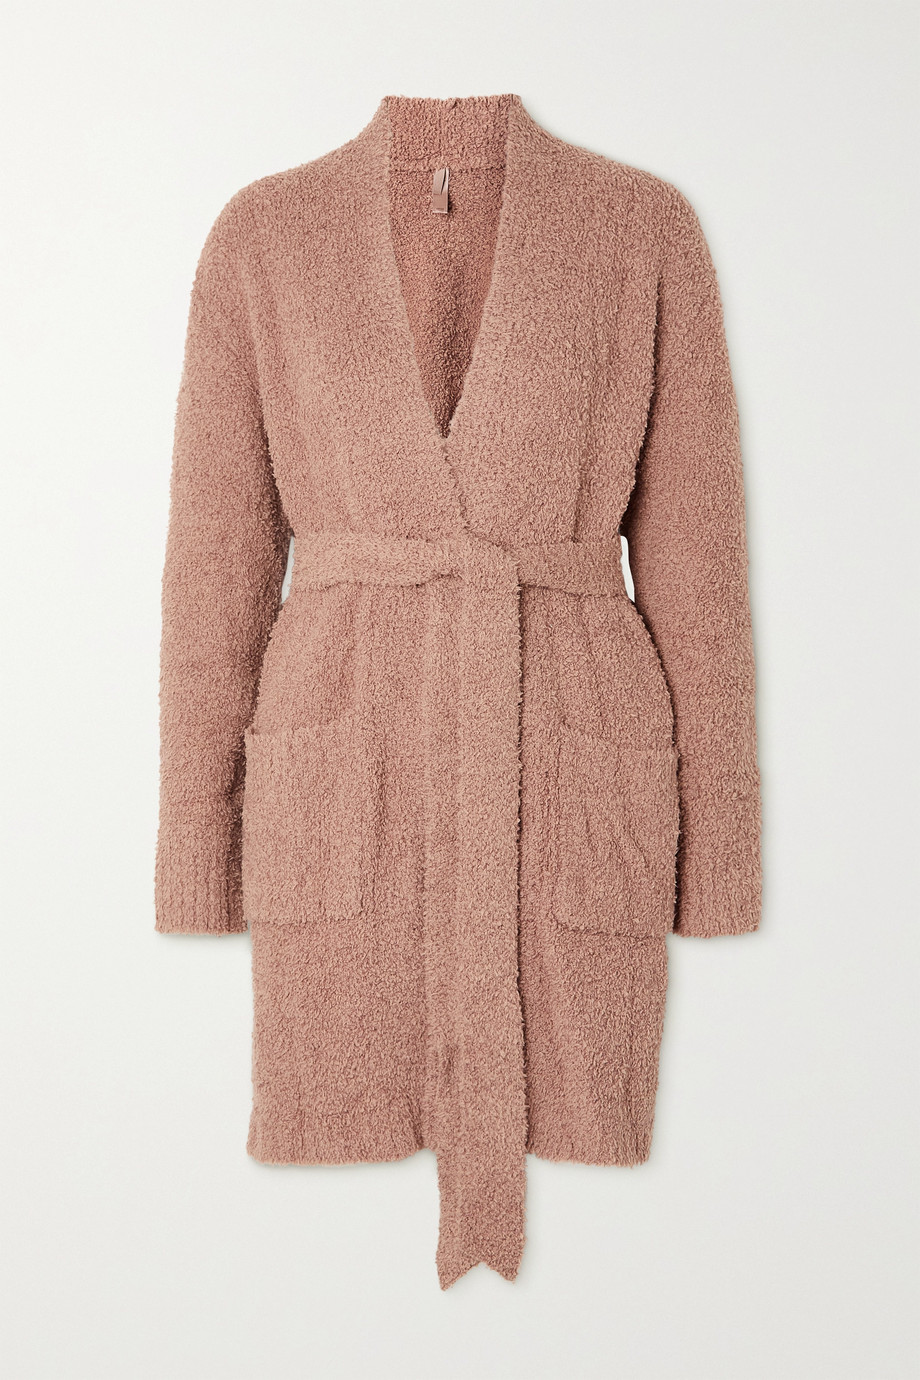 SKIMS Cozy Knit Robe – Rose Clay – Morgenmantel aus Bouclé